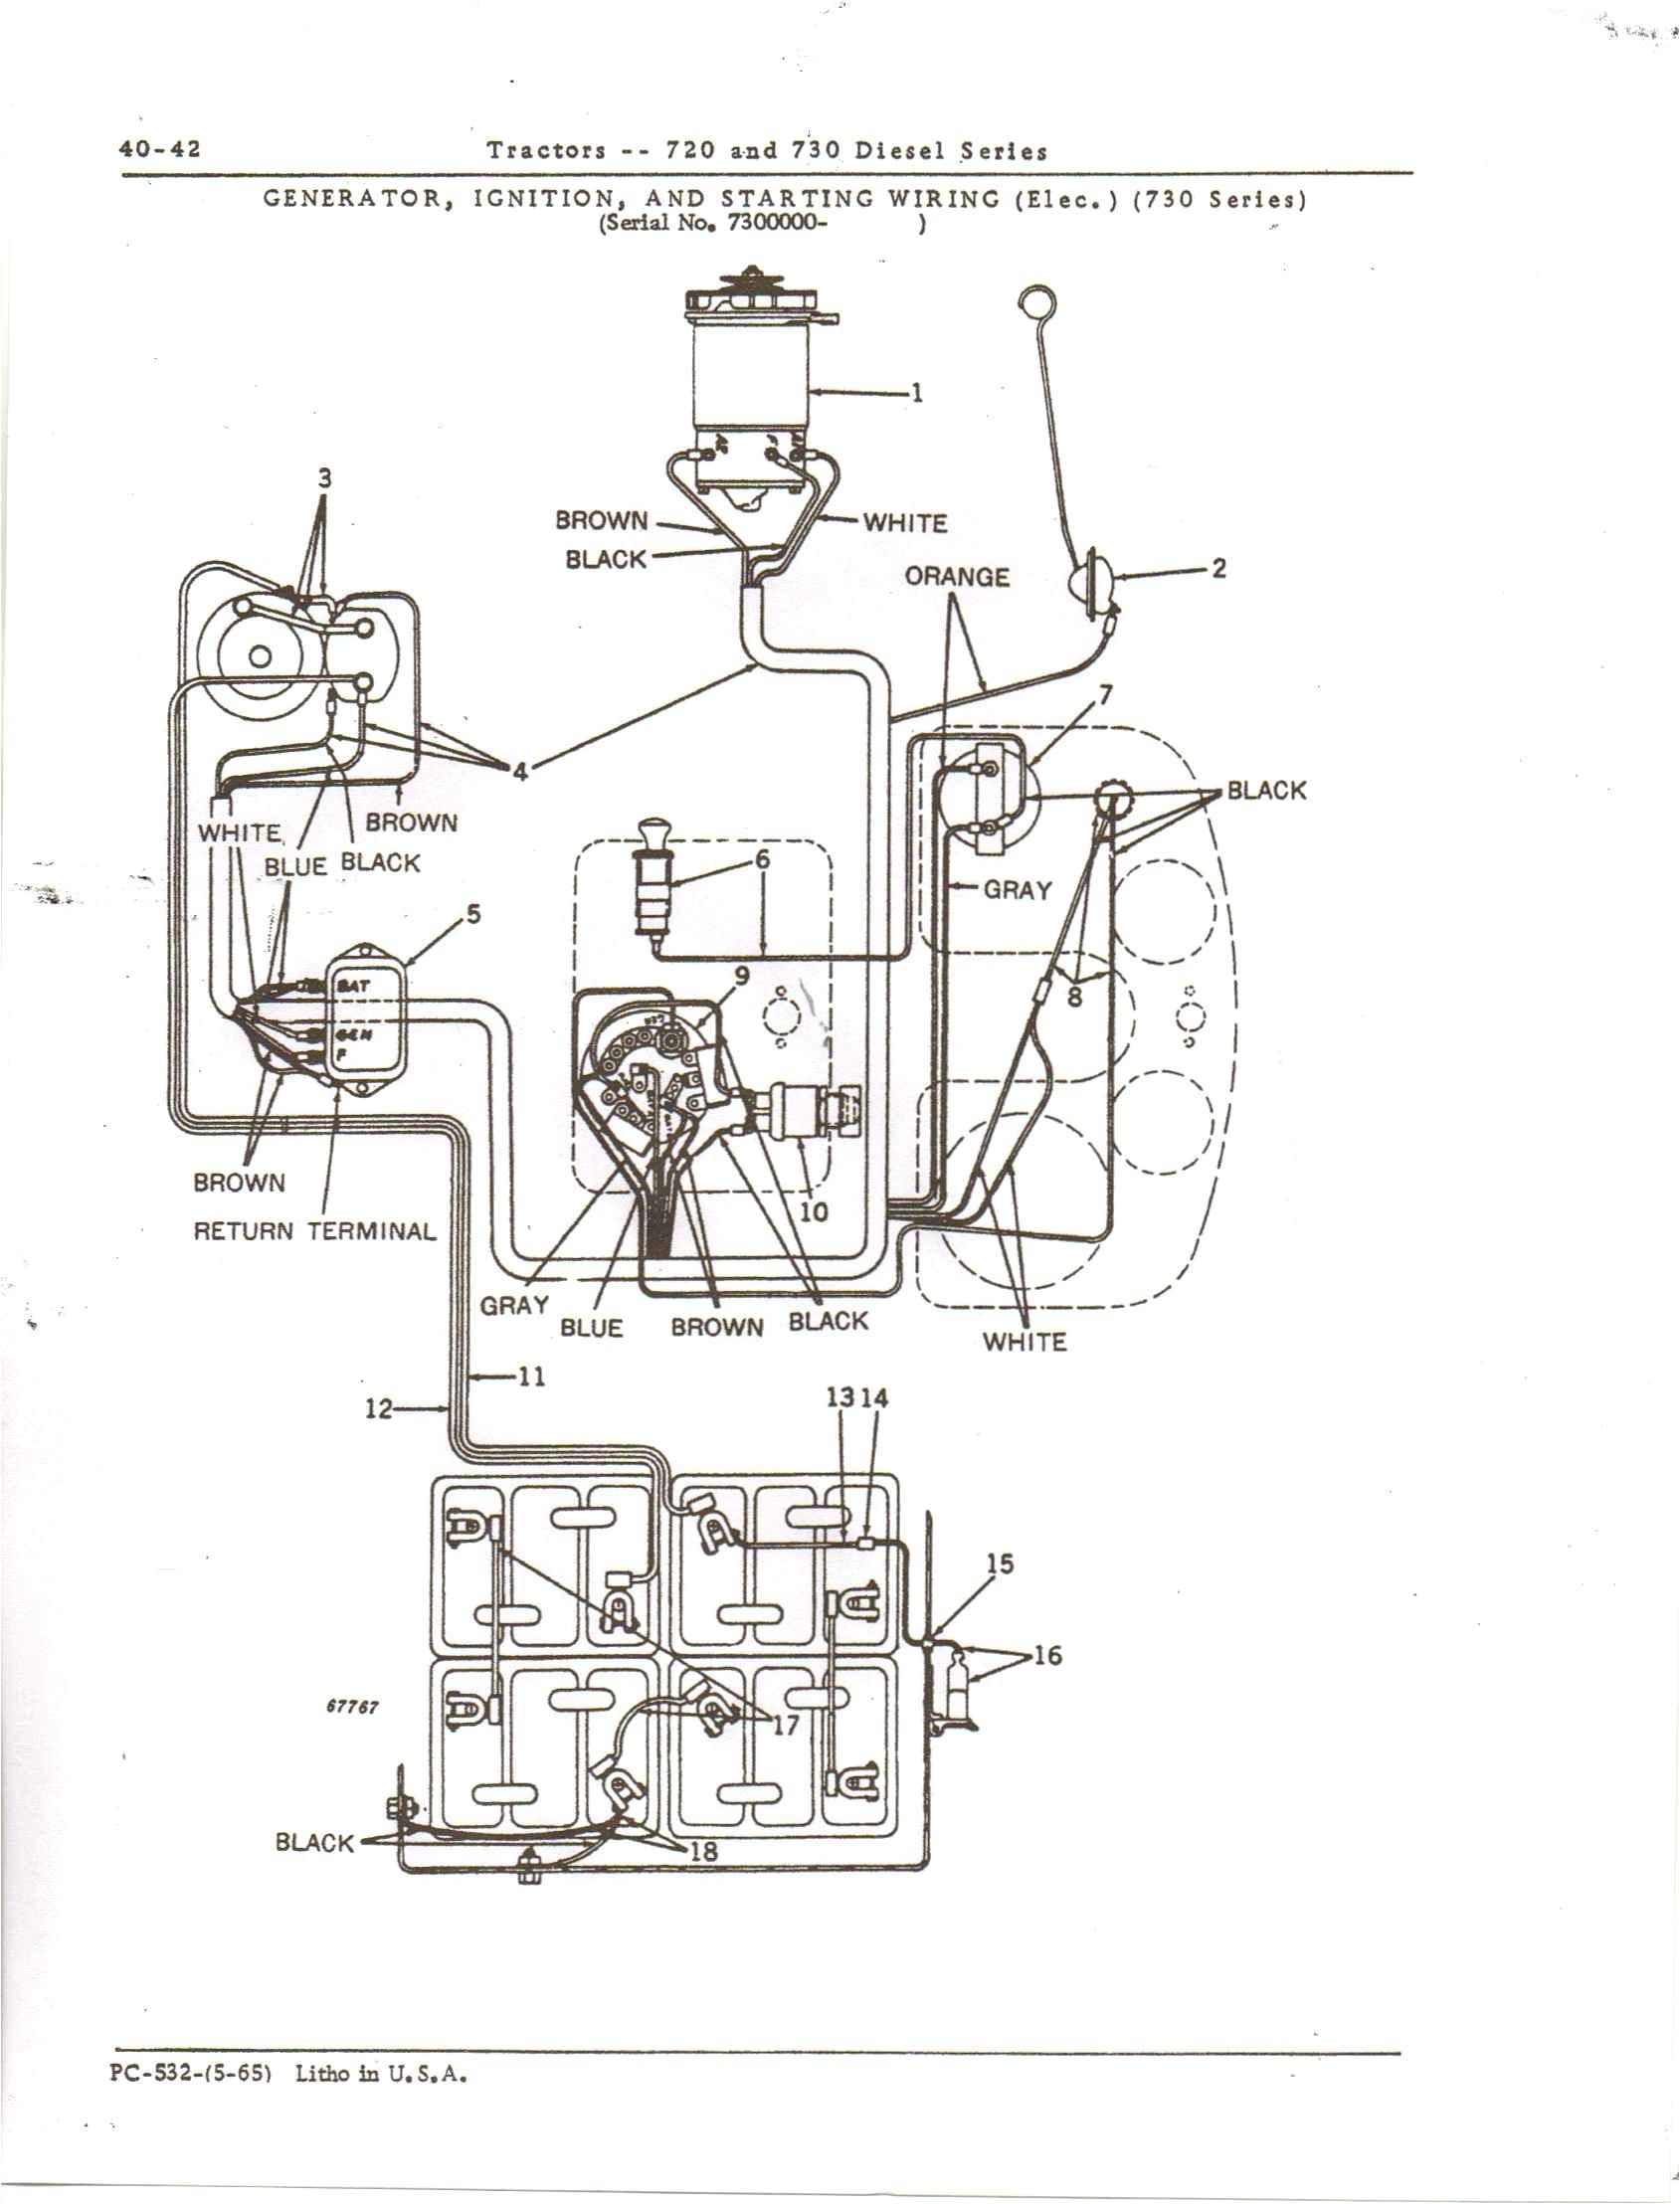 john deere 420 wiring diagram wiring diagram sheet for 420 garden tractor wiring